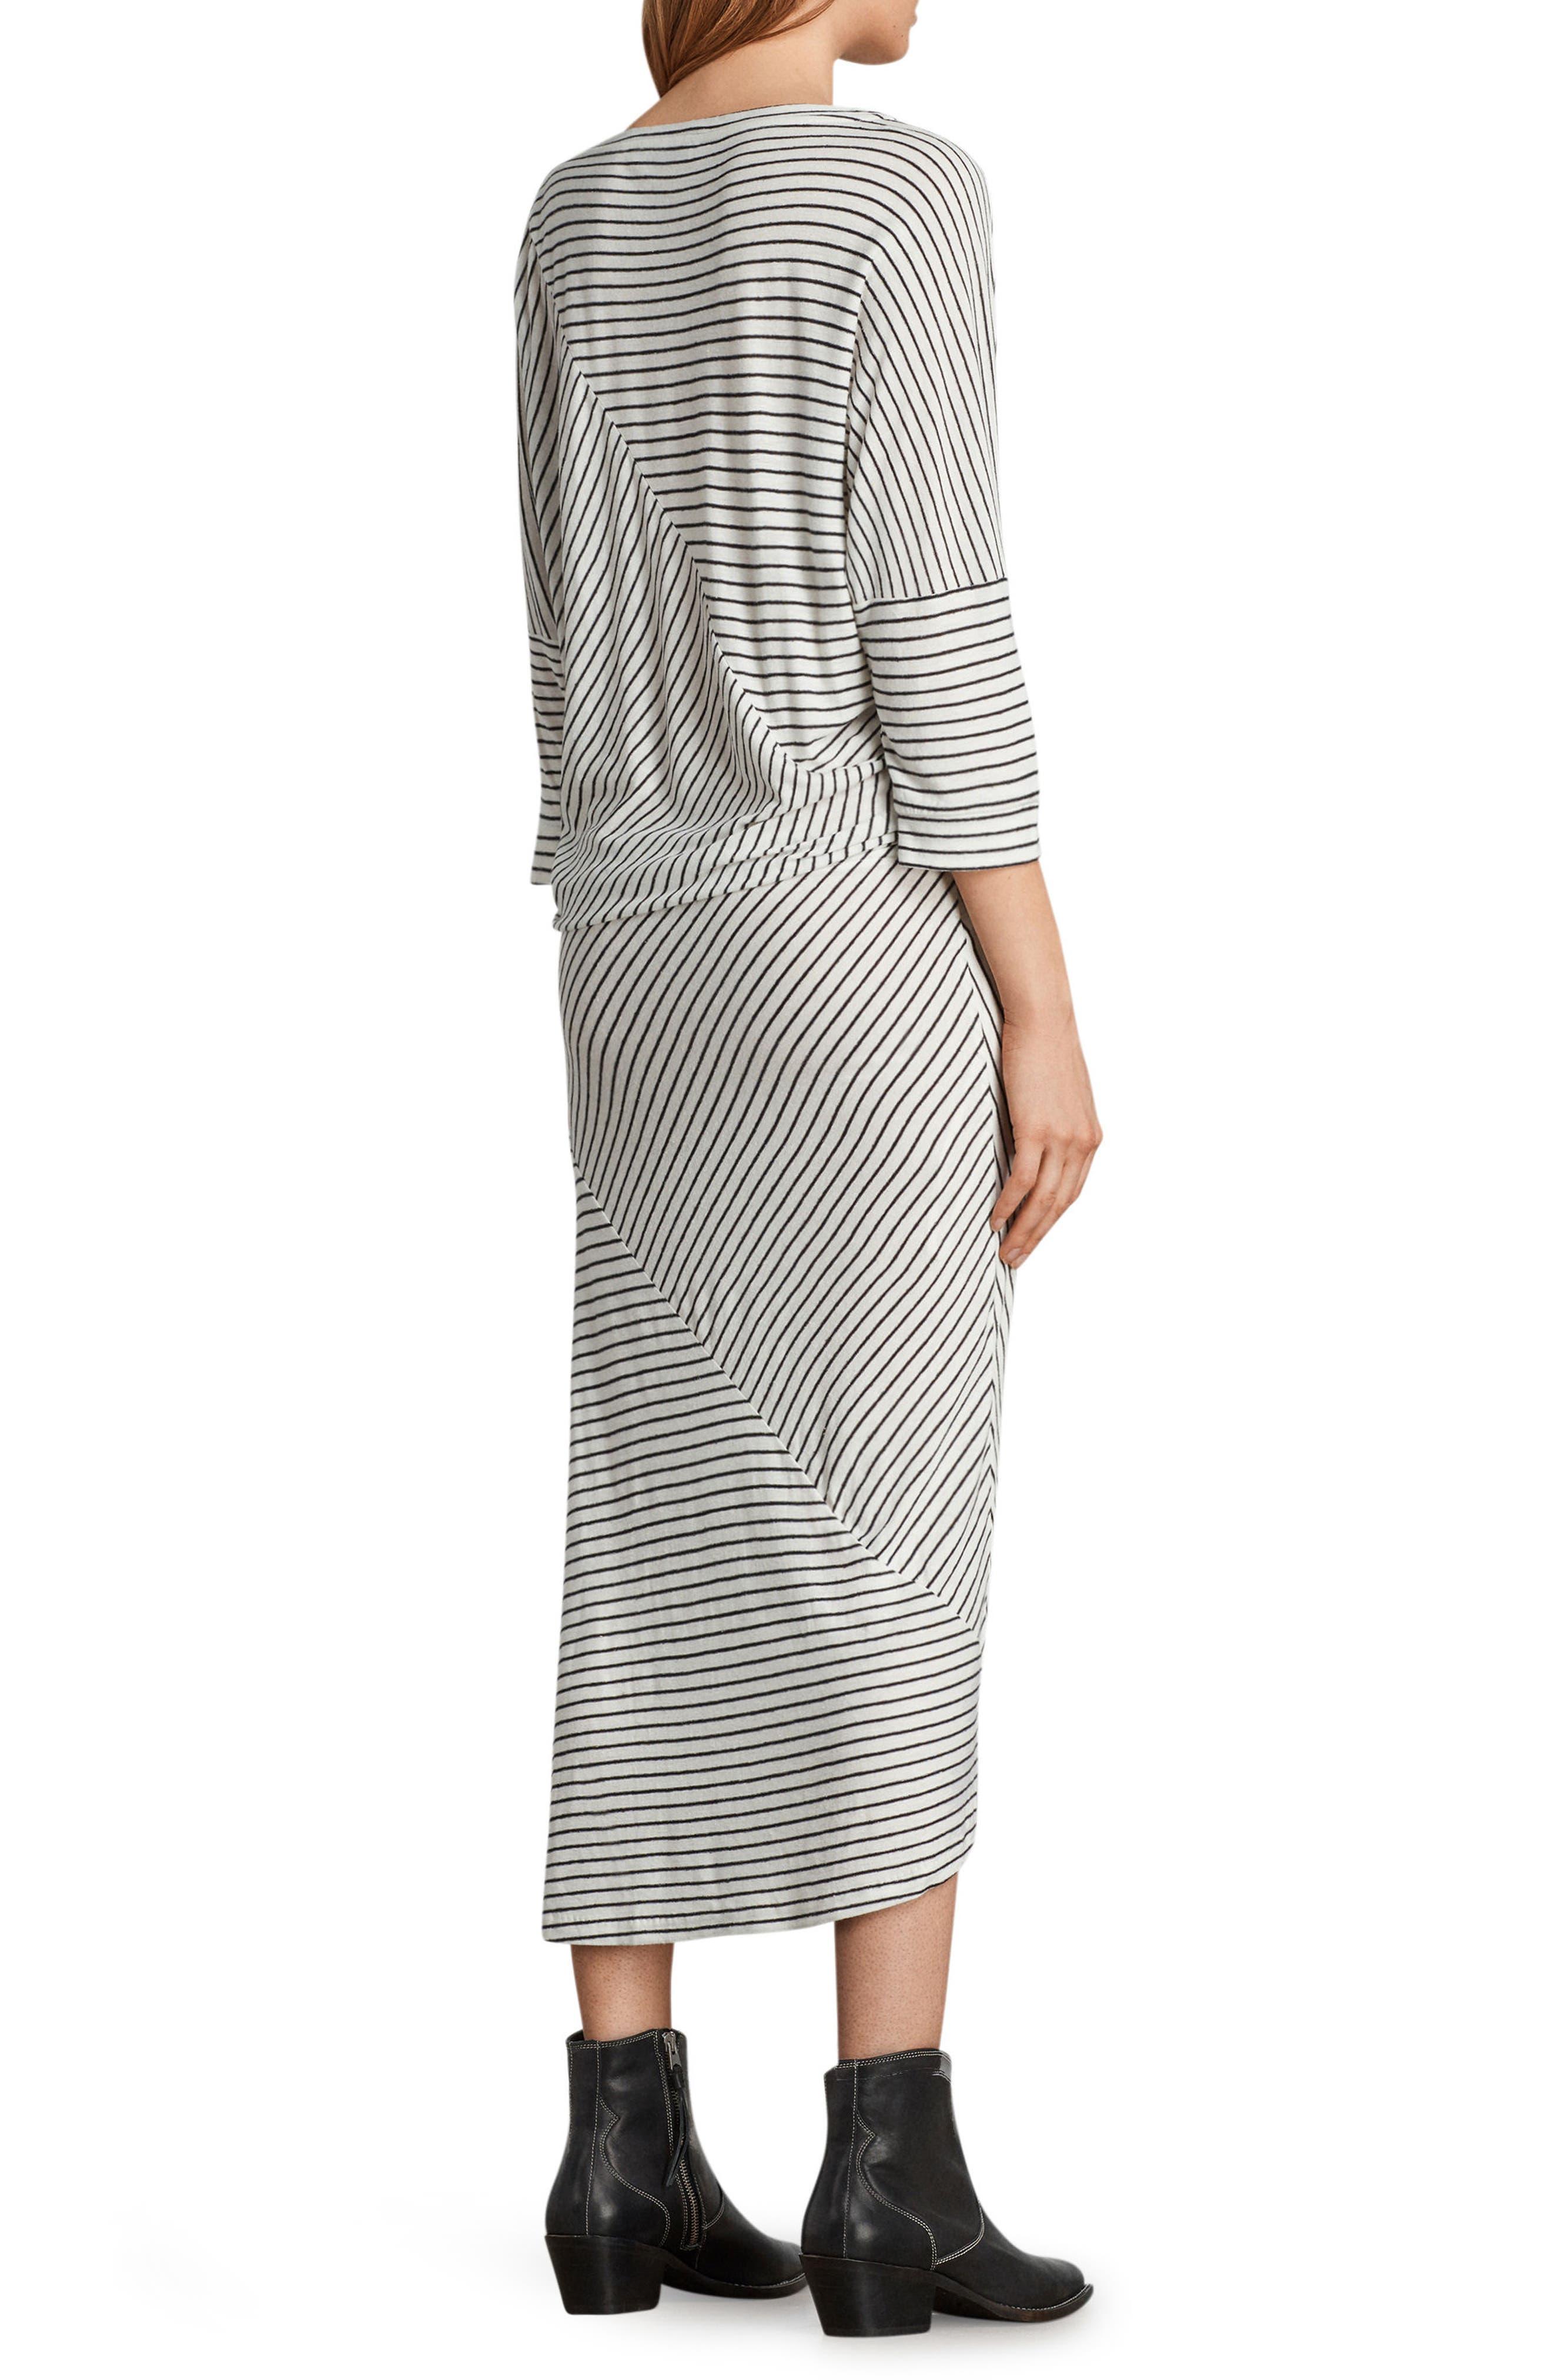 Cadie Stripe Midi Dress,                             Alternate thumbnail 2, color,                             Ecru White/ Black